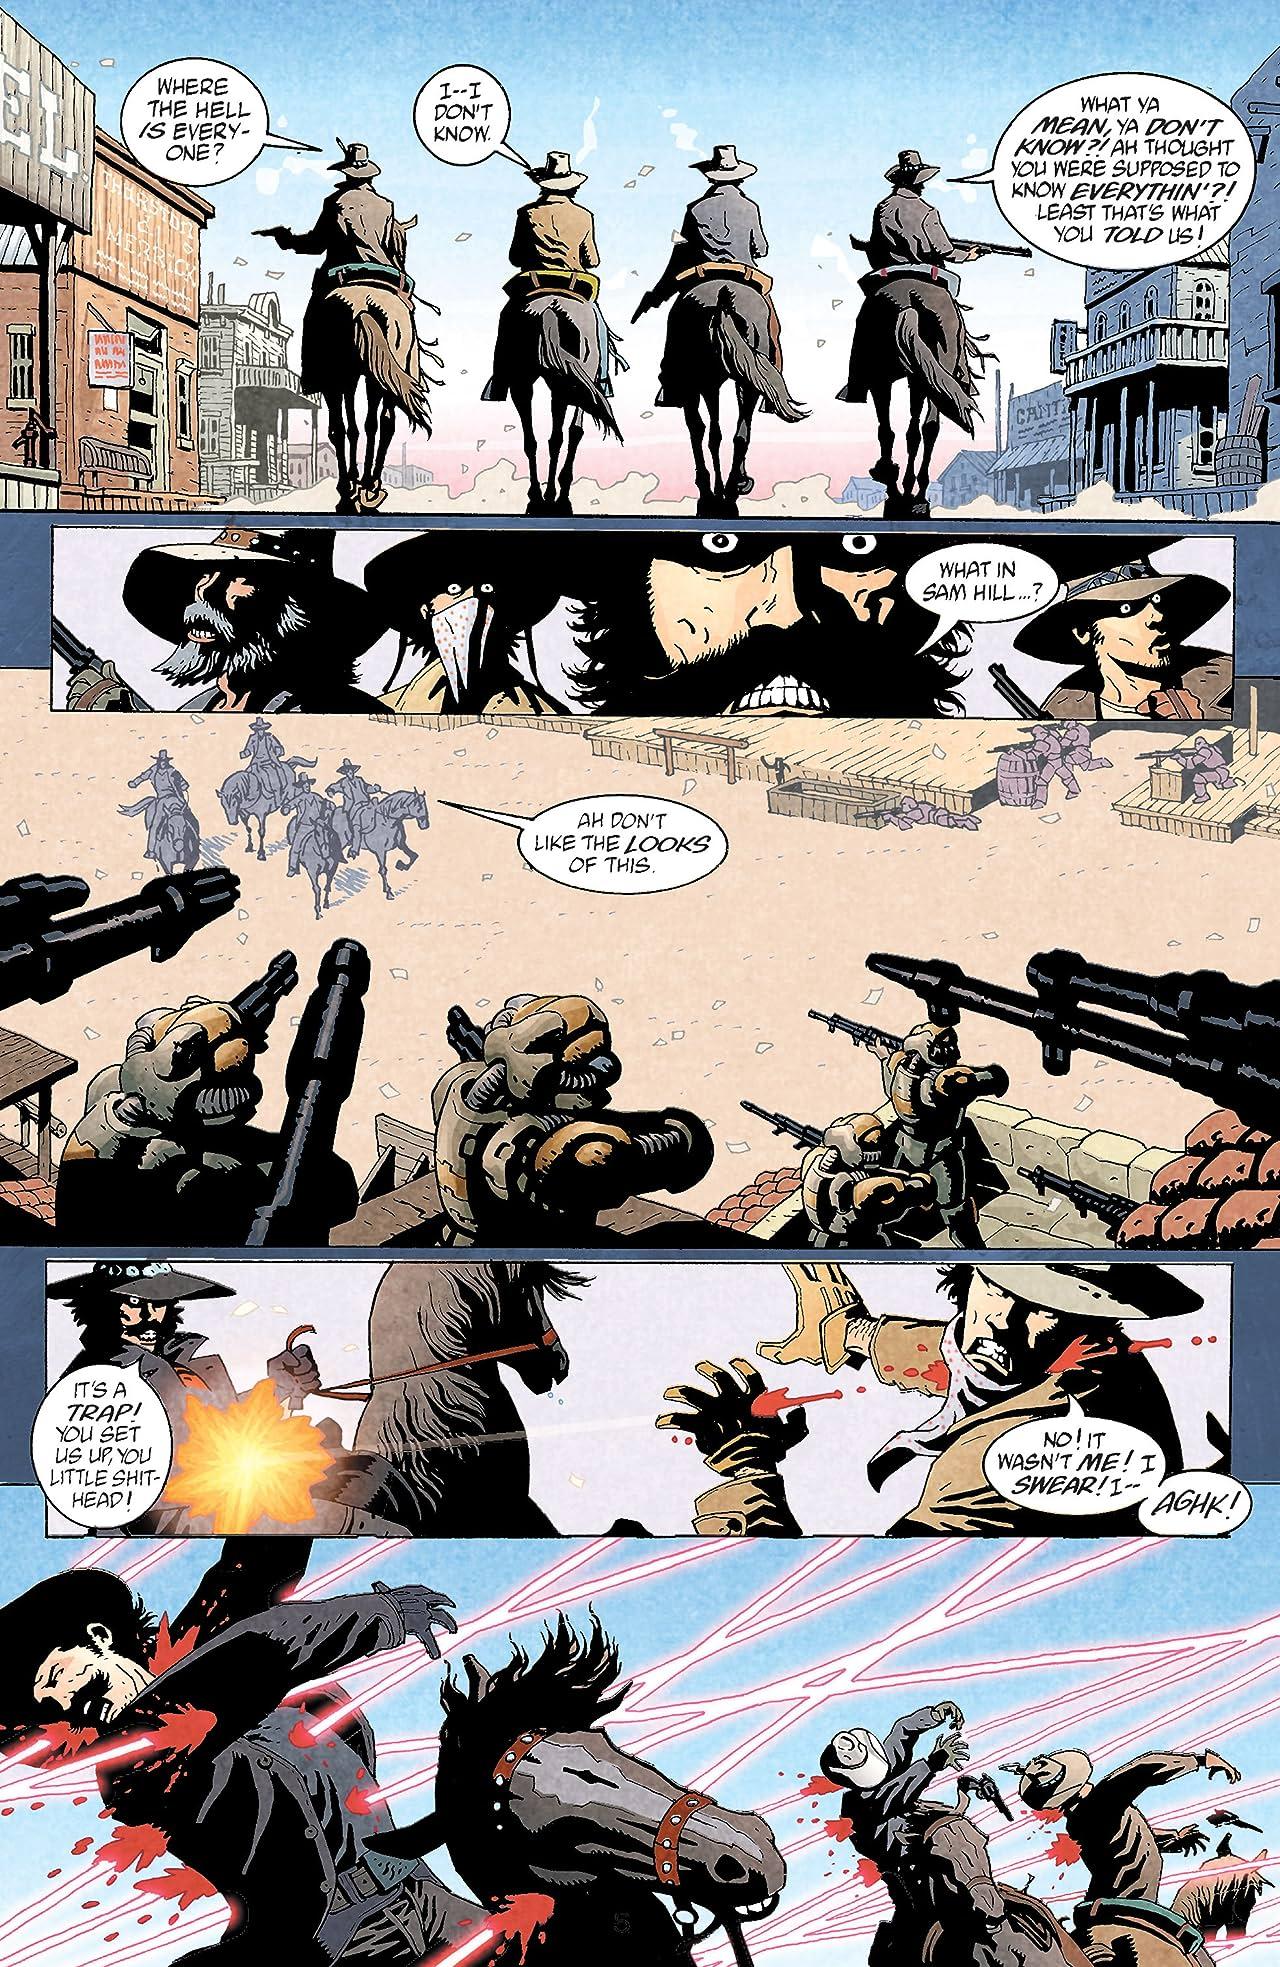 Weird Western Tales (2001) #2